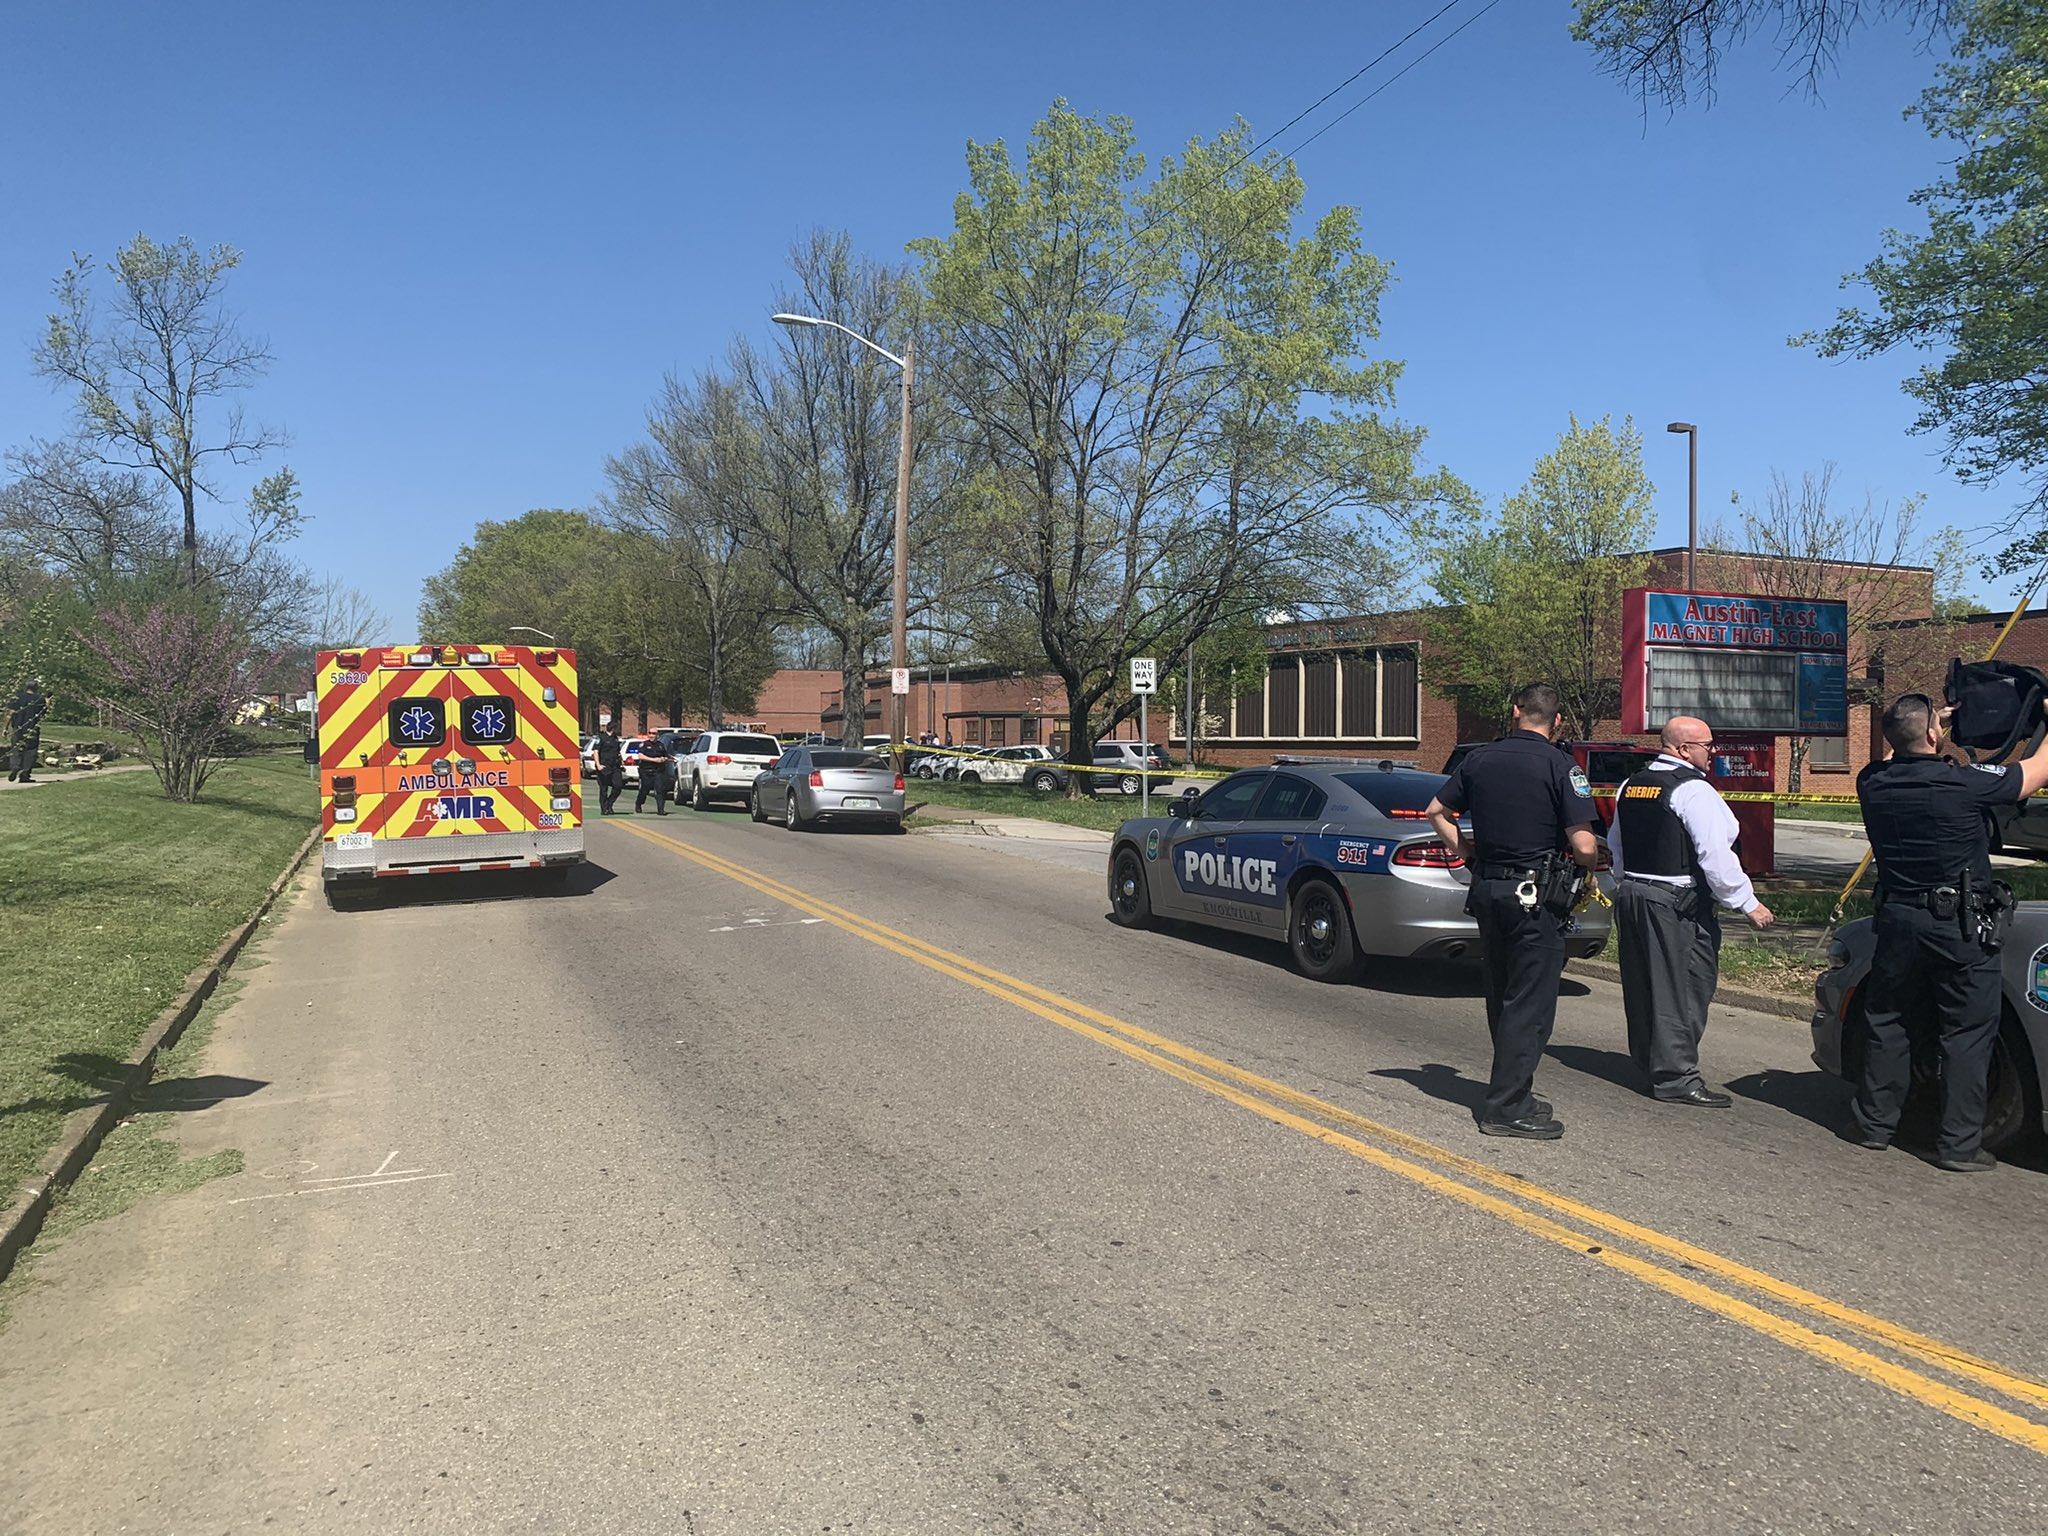 1 Dead in Tennessee High School Schooting